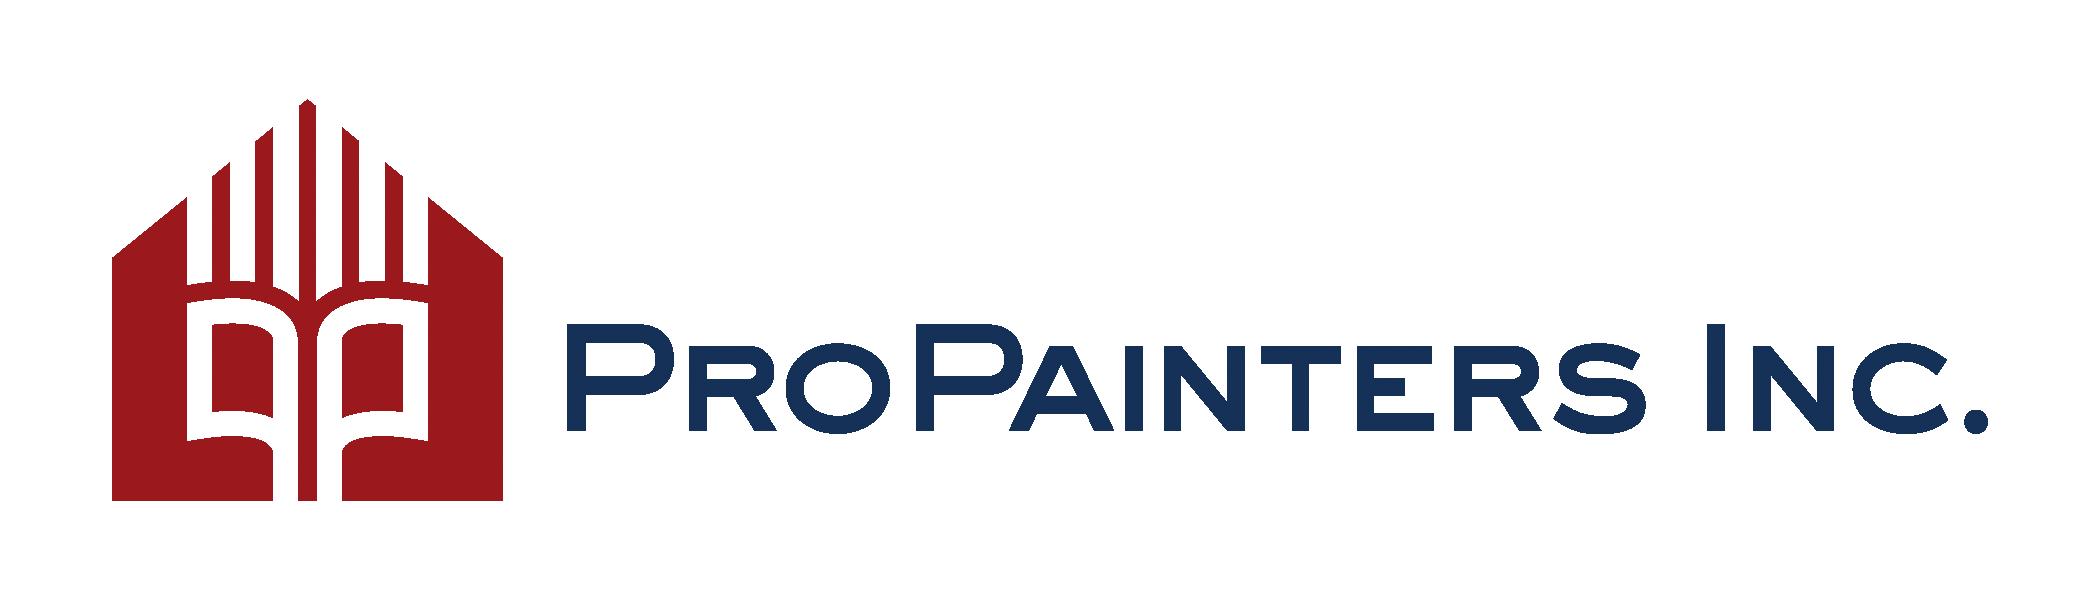 ProPainters, Inc